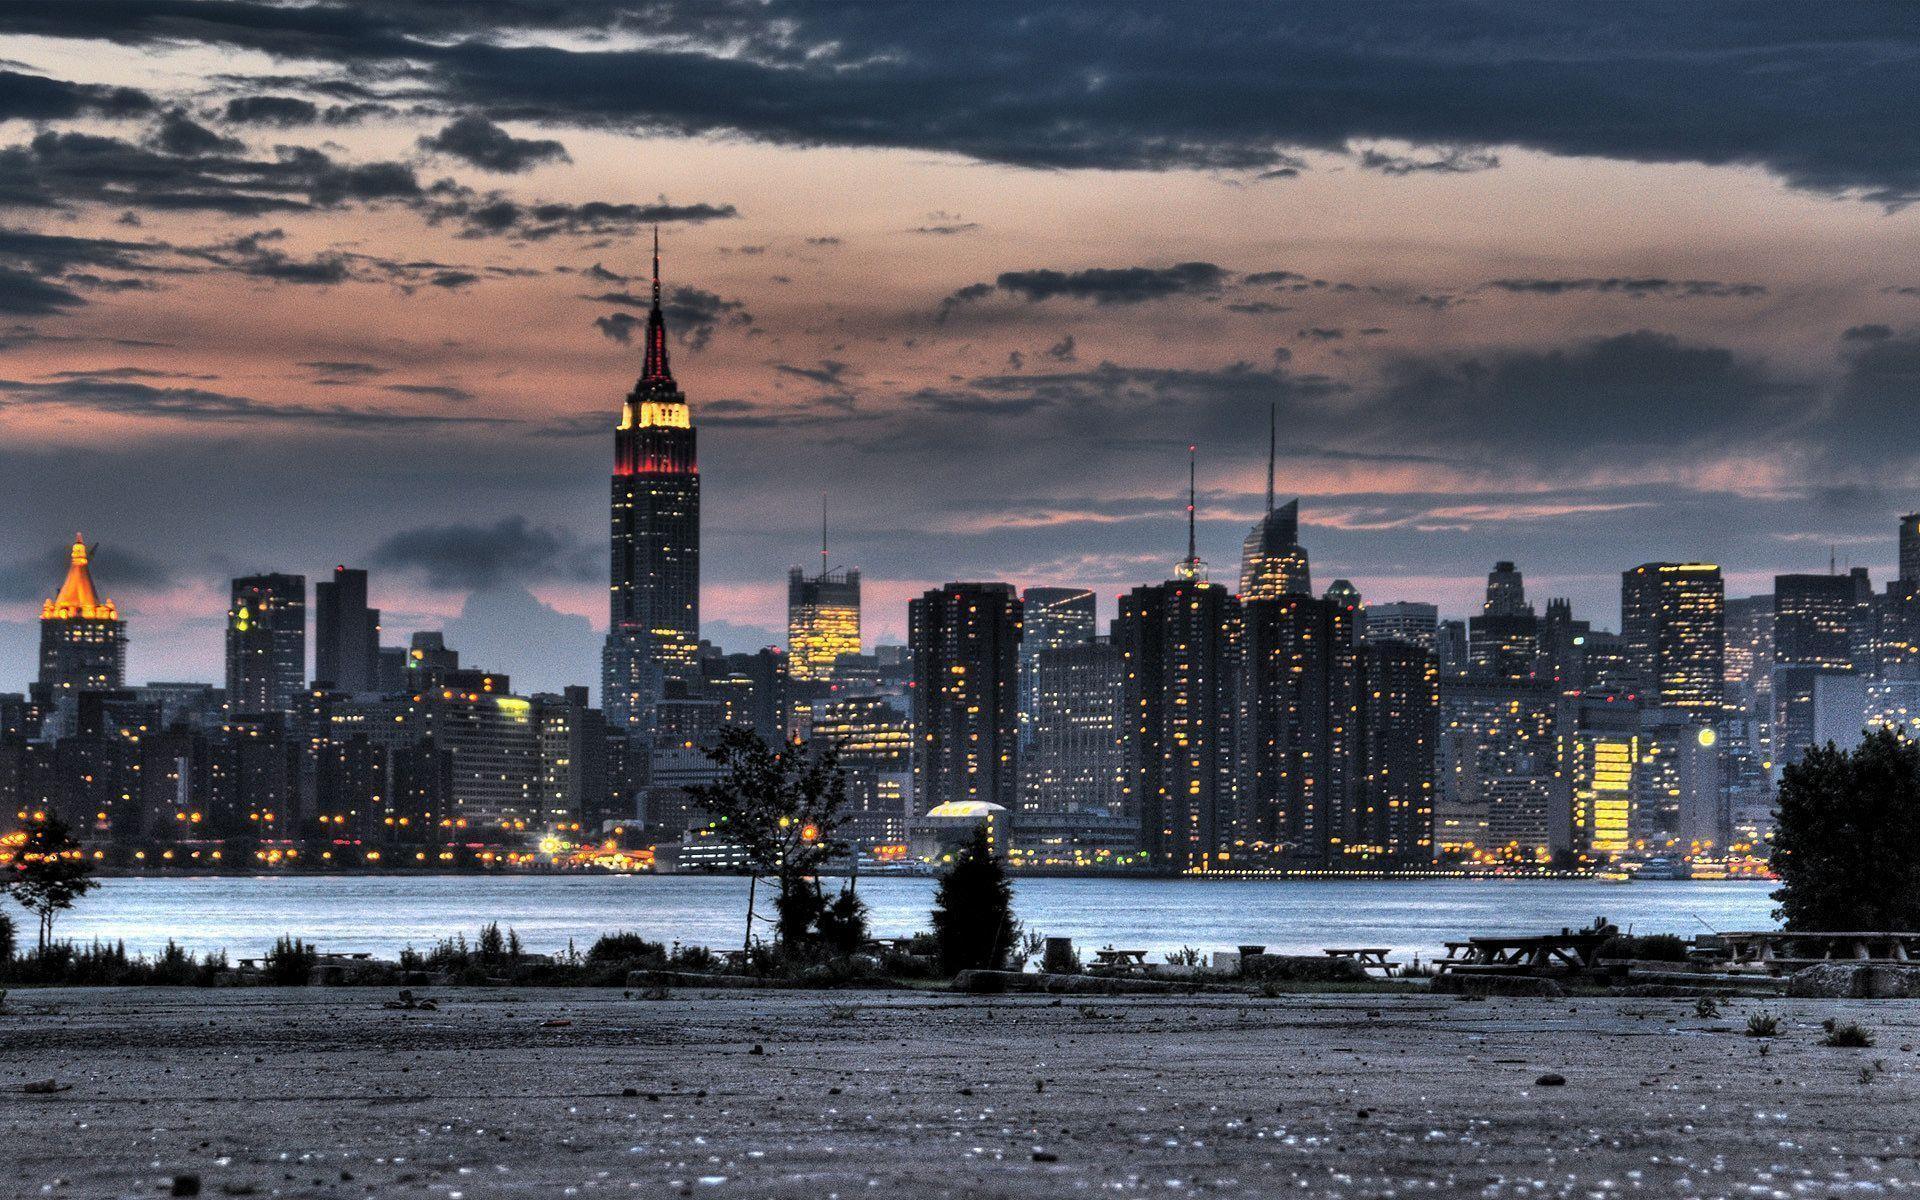 City Skyline Wallpapers 1920x1200